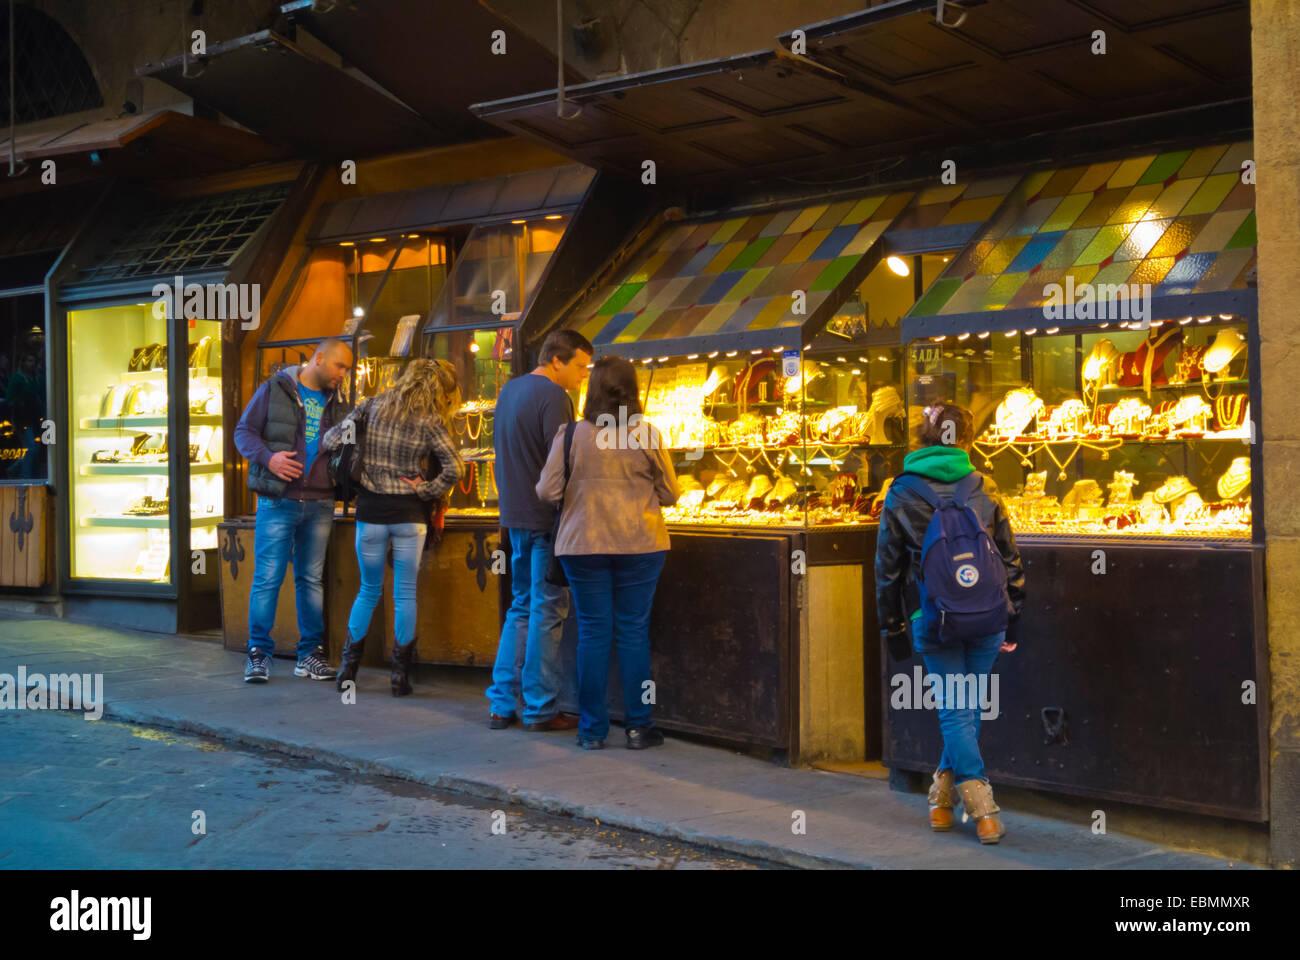 Goldsmith jewelry stores, Ponte Vecchio, old bridge, Florence, Tuscany, Italy - Stock Image